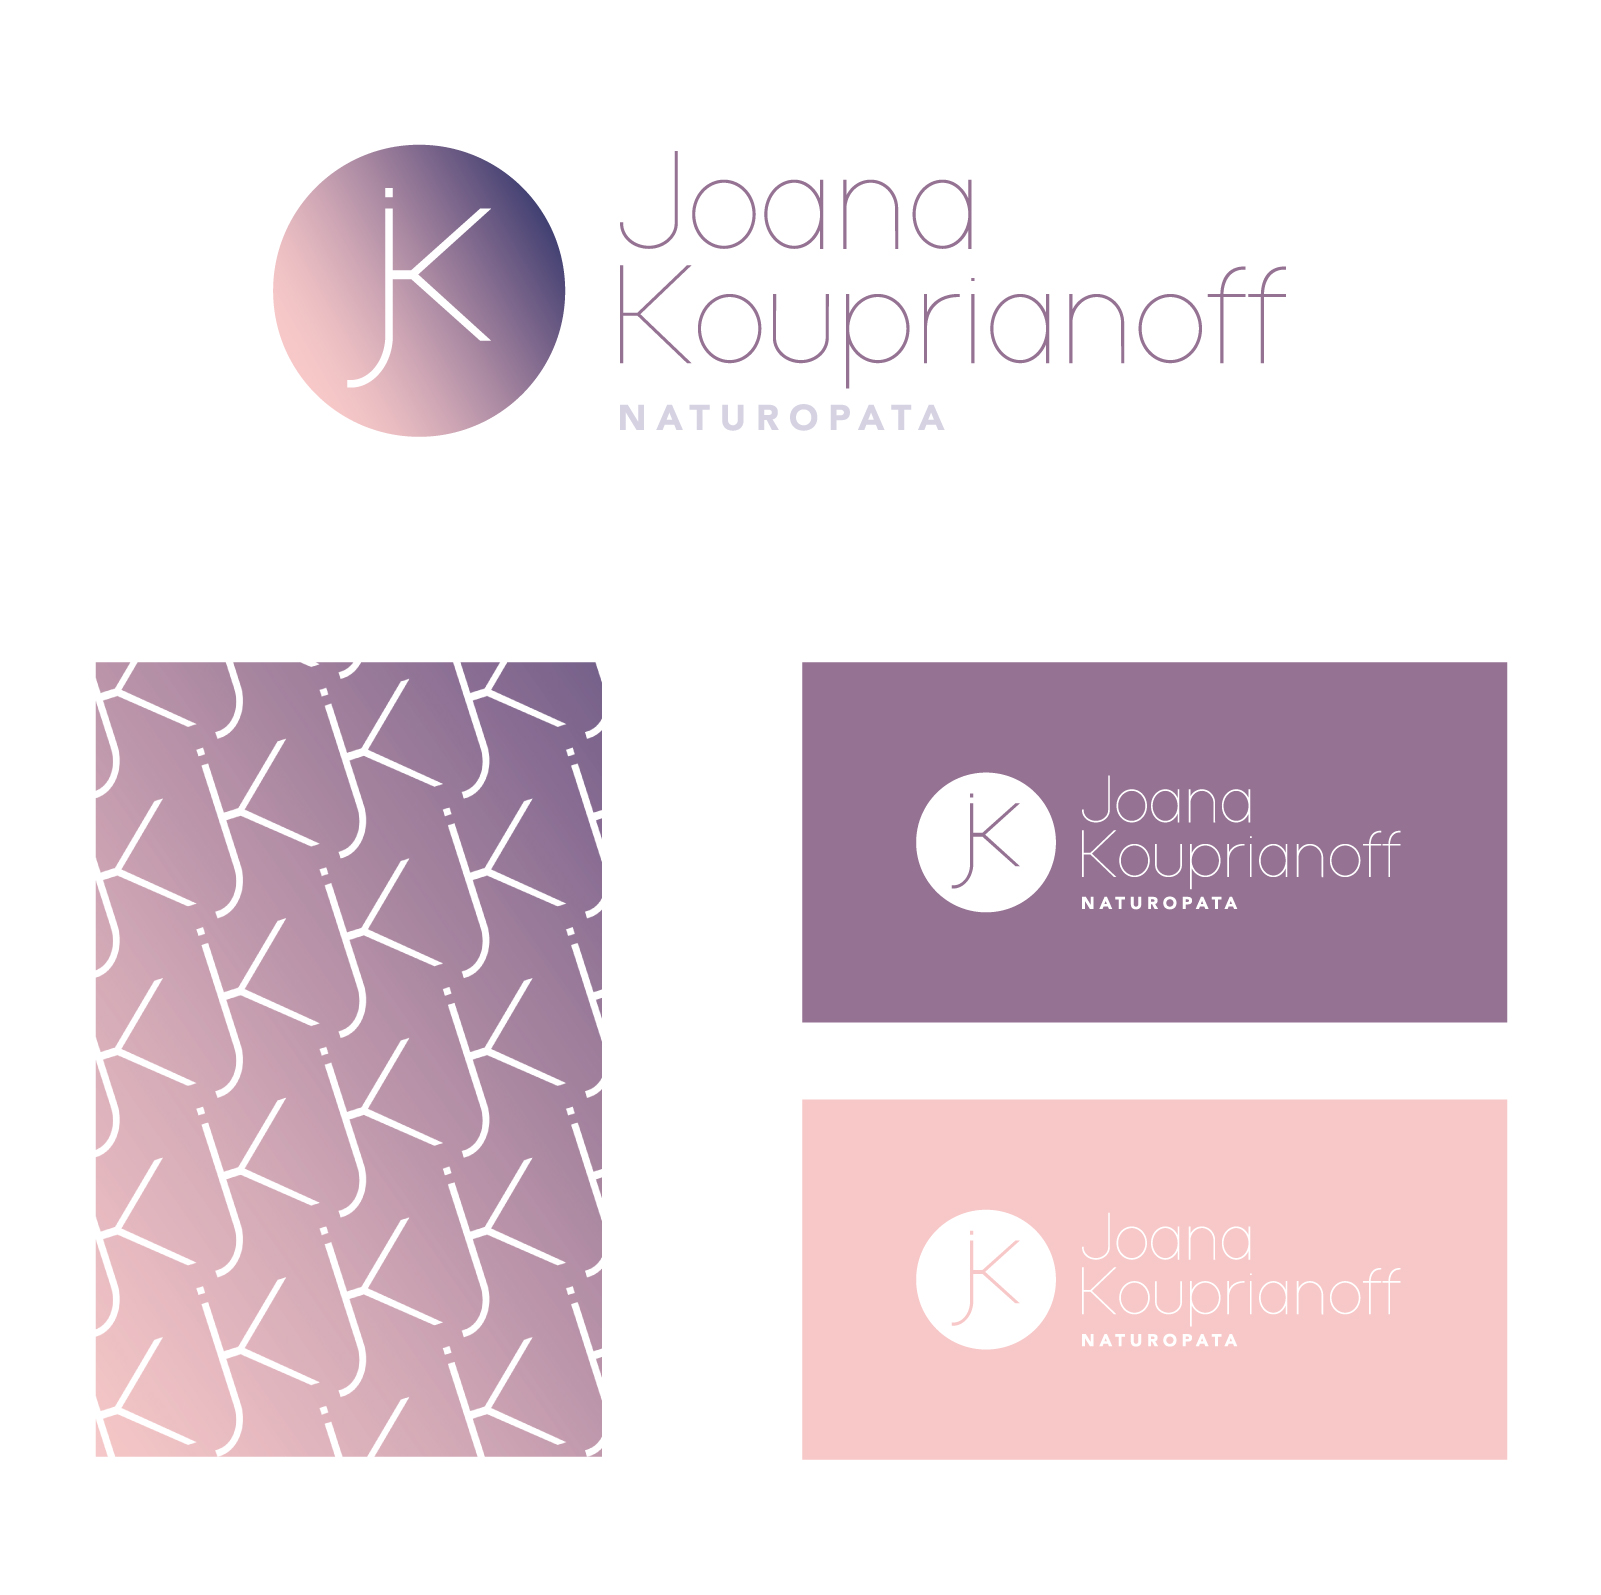 joana-kouprianoff-lance